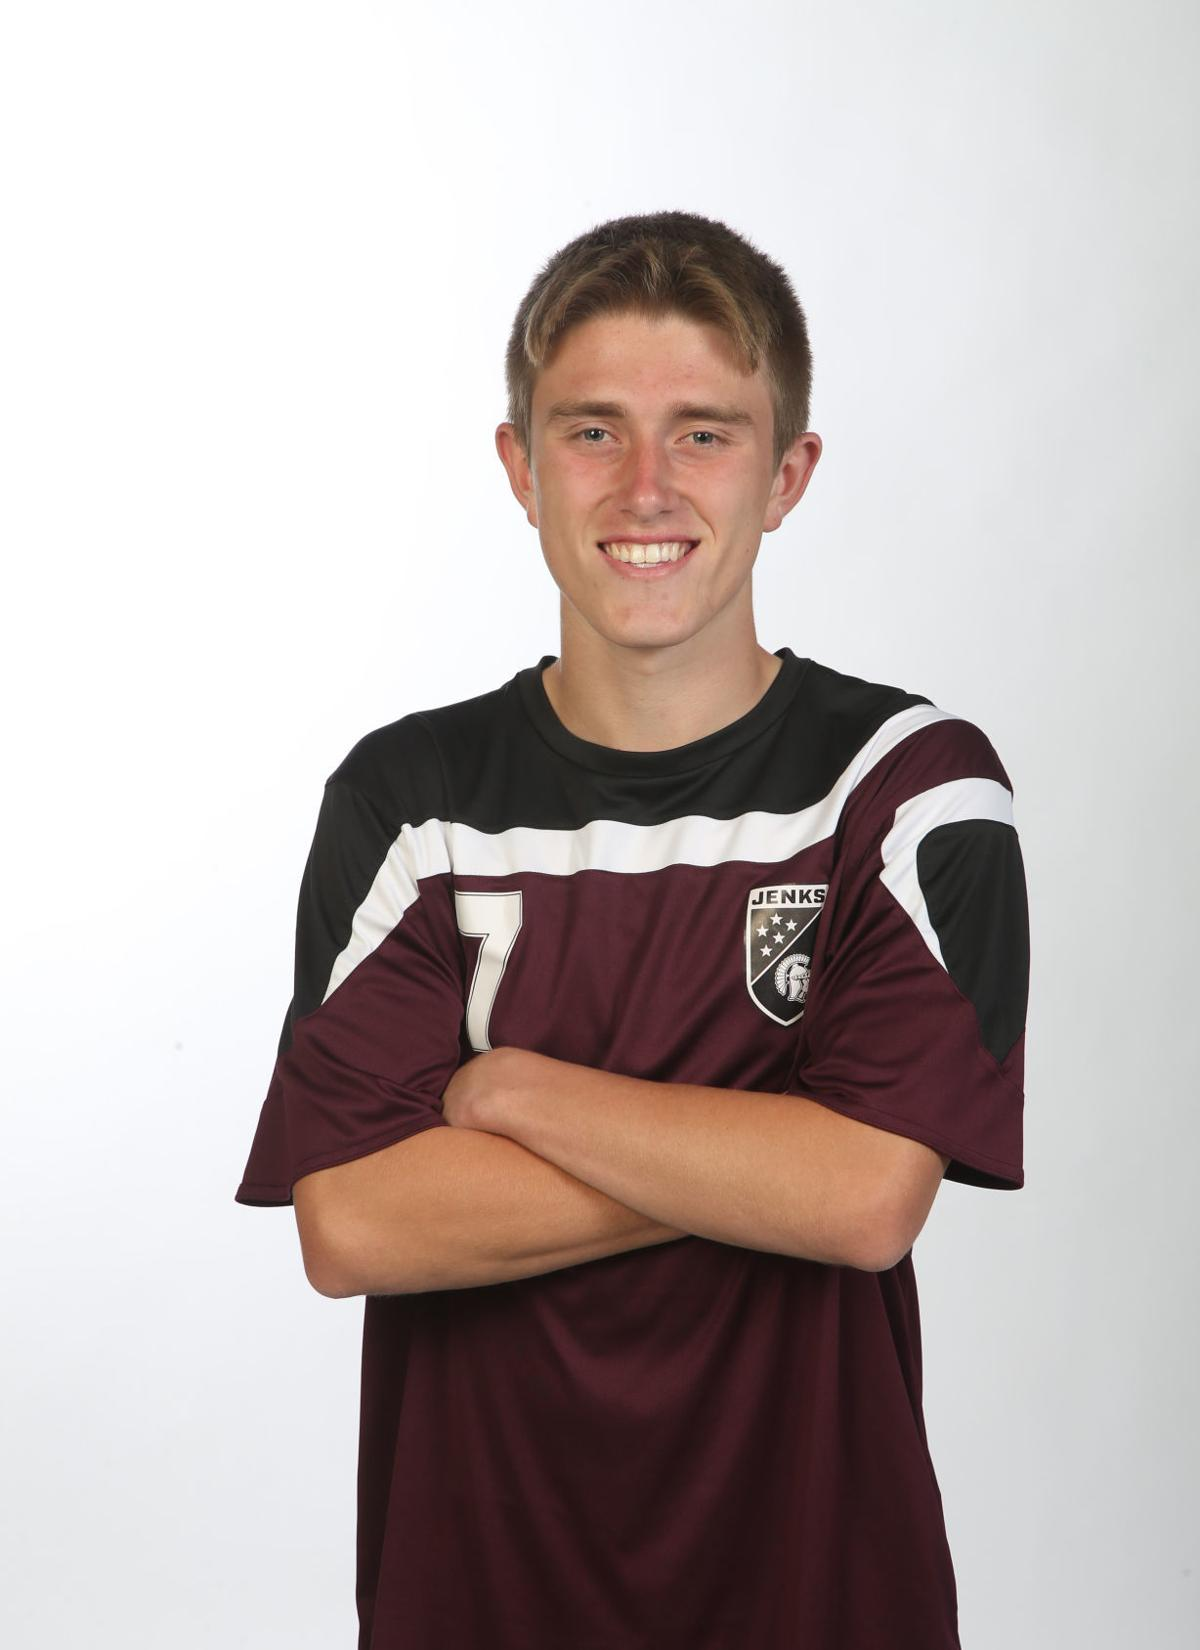 HS All World soccer: Jenks soccer player Will Edwards